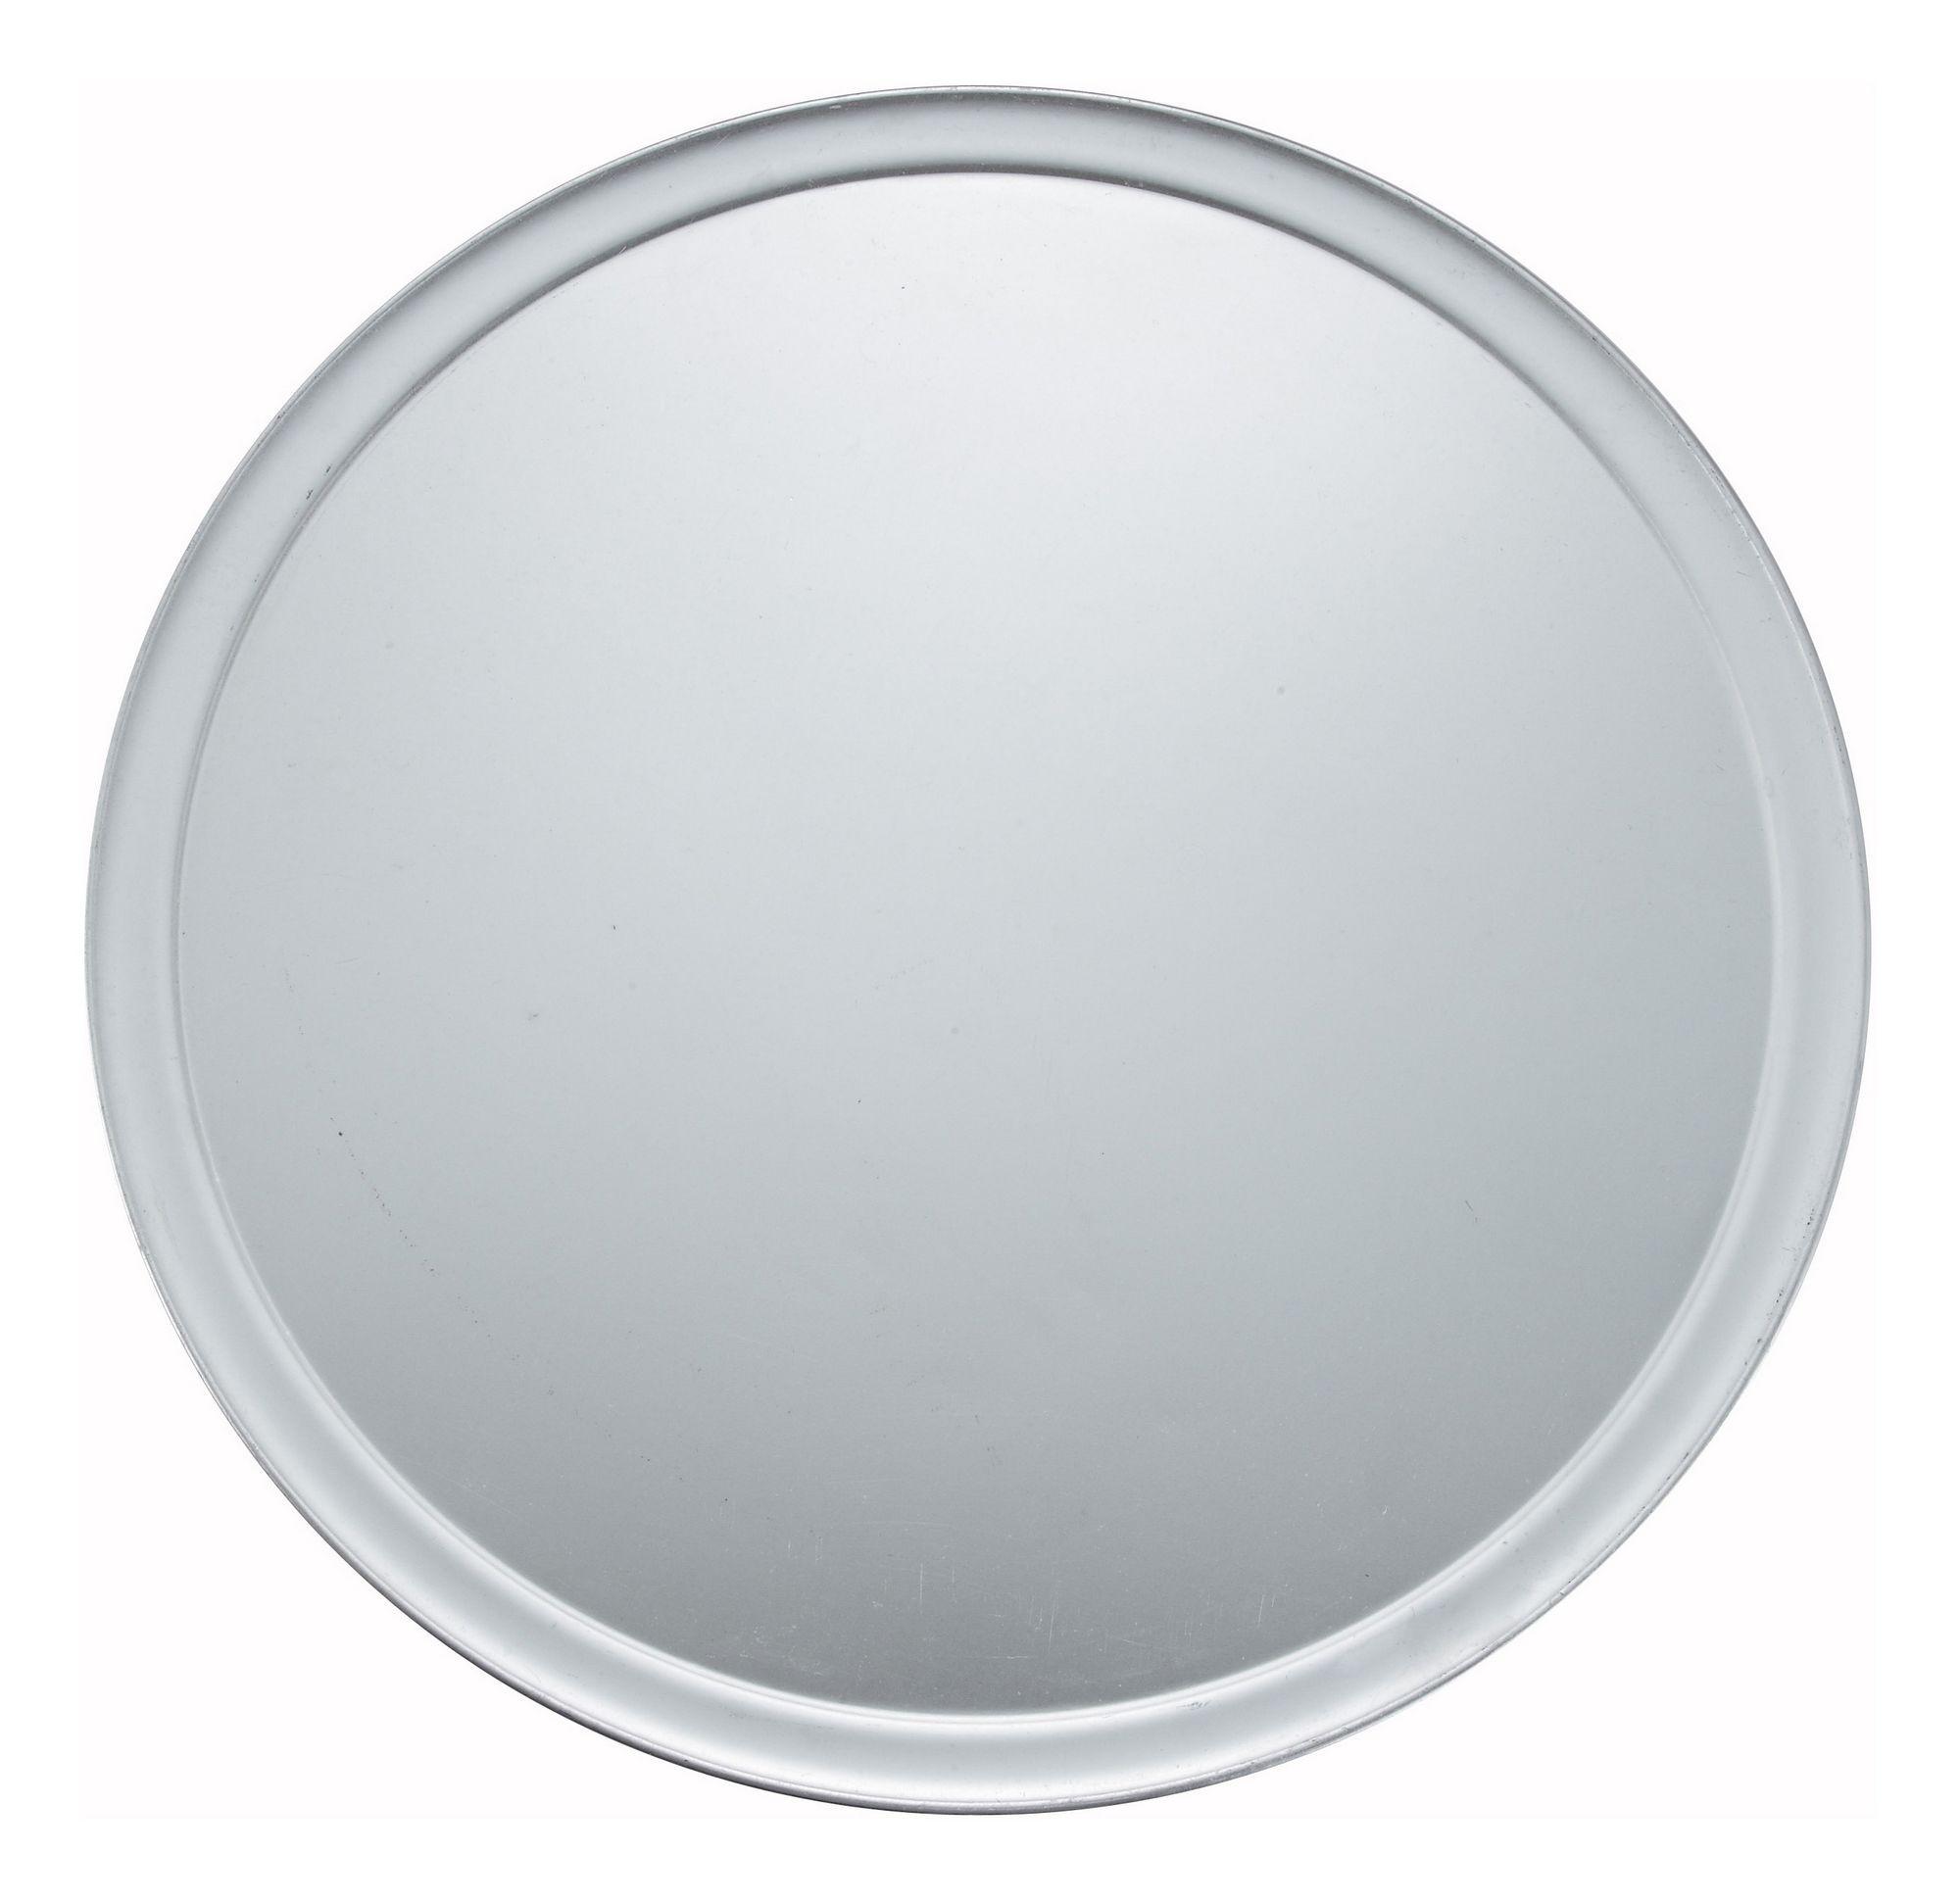 "Winco APZT-19 Wide-Rimmed Aluminum Pizza Pan 19"" Dia."